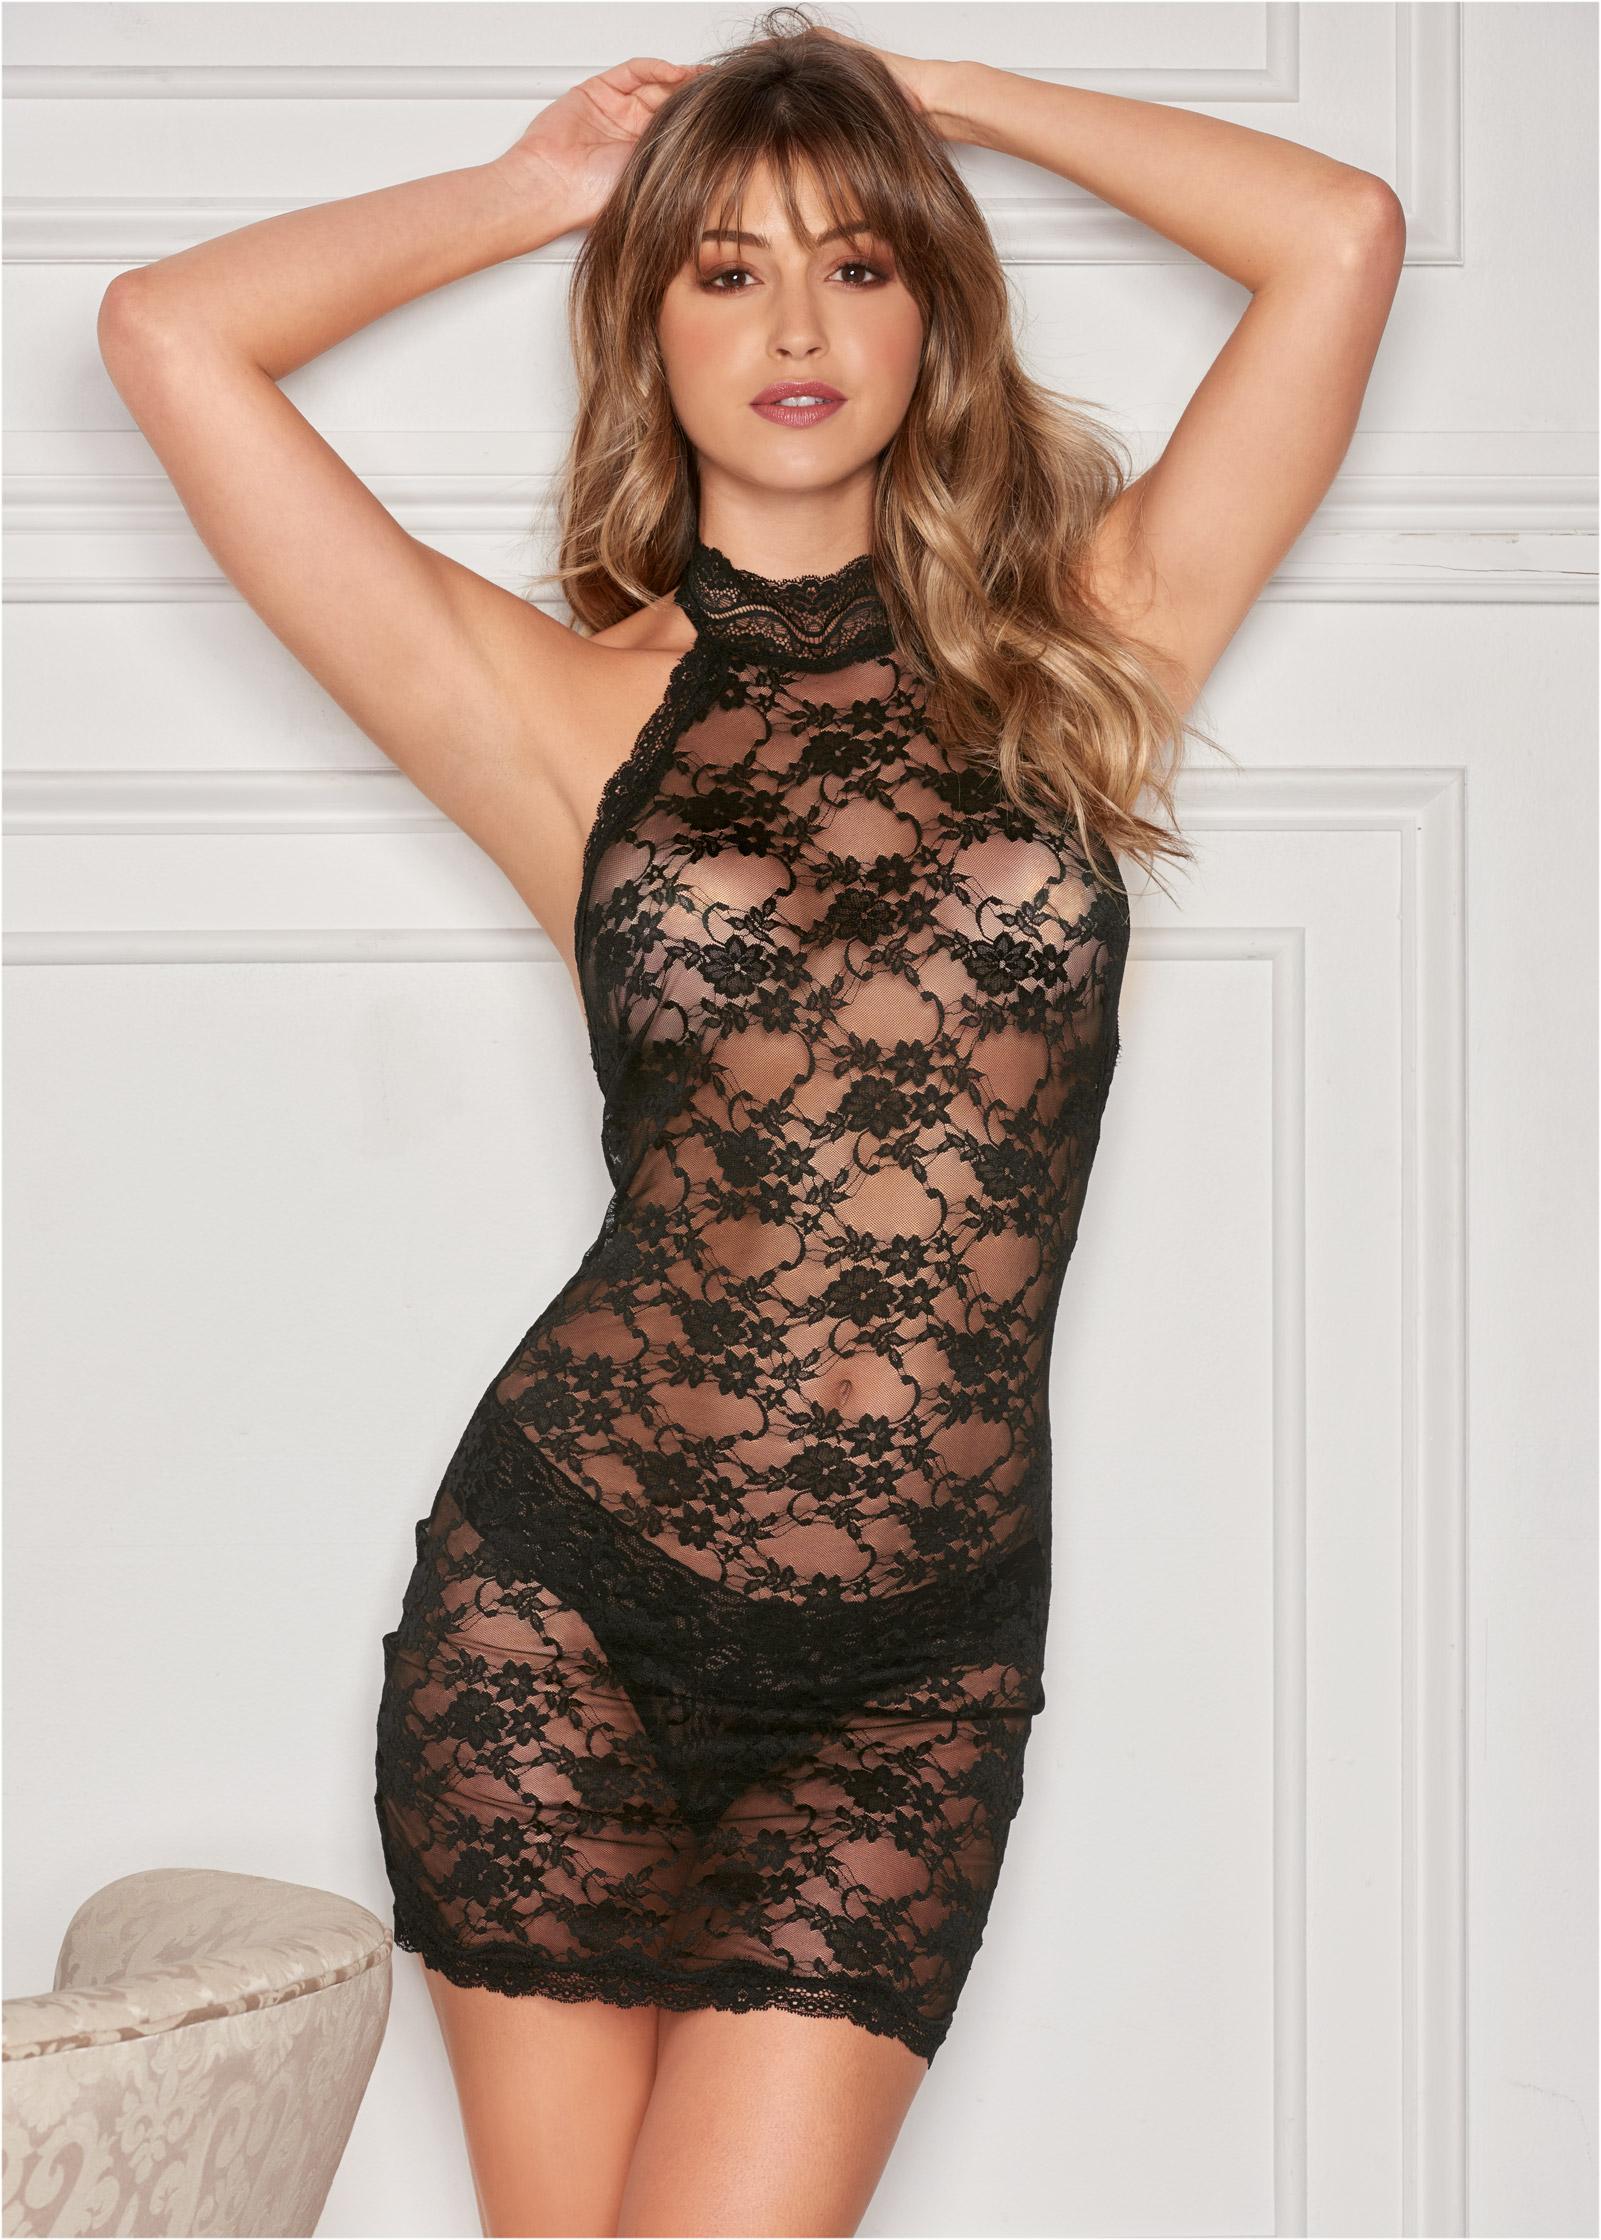 Sexy lingerie pix